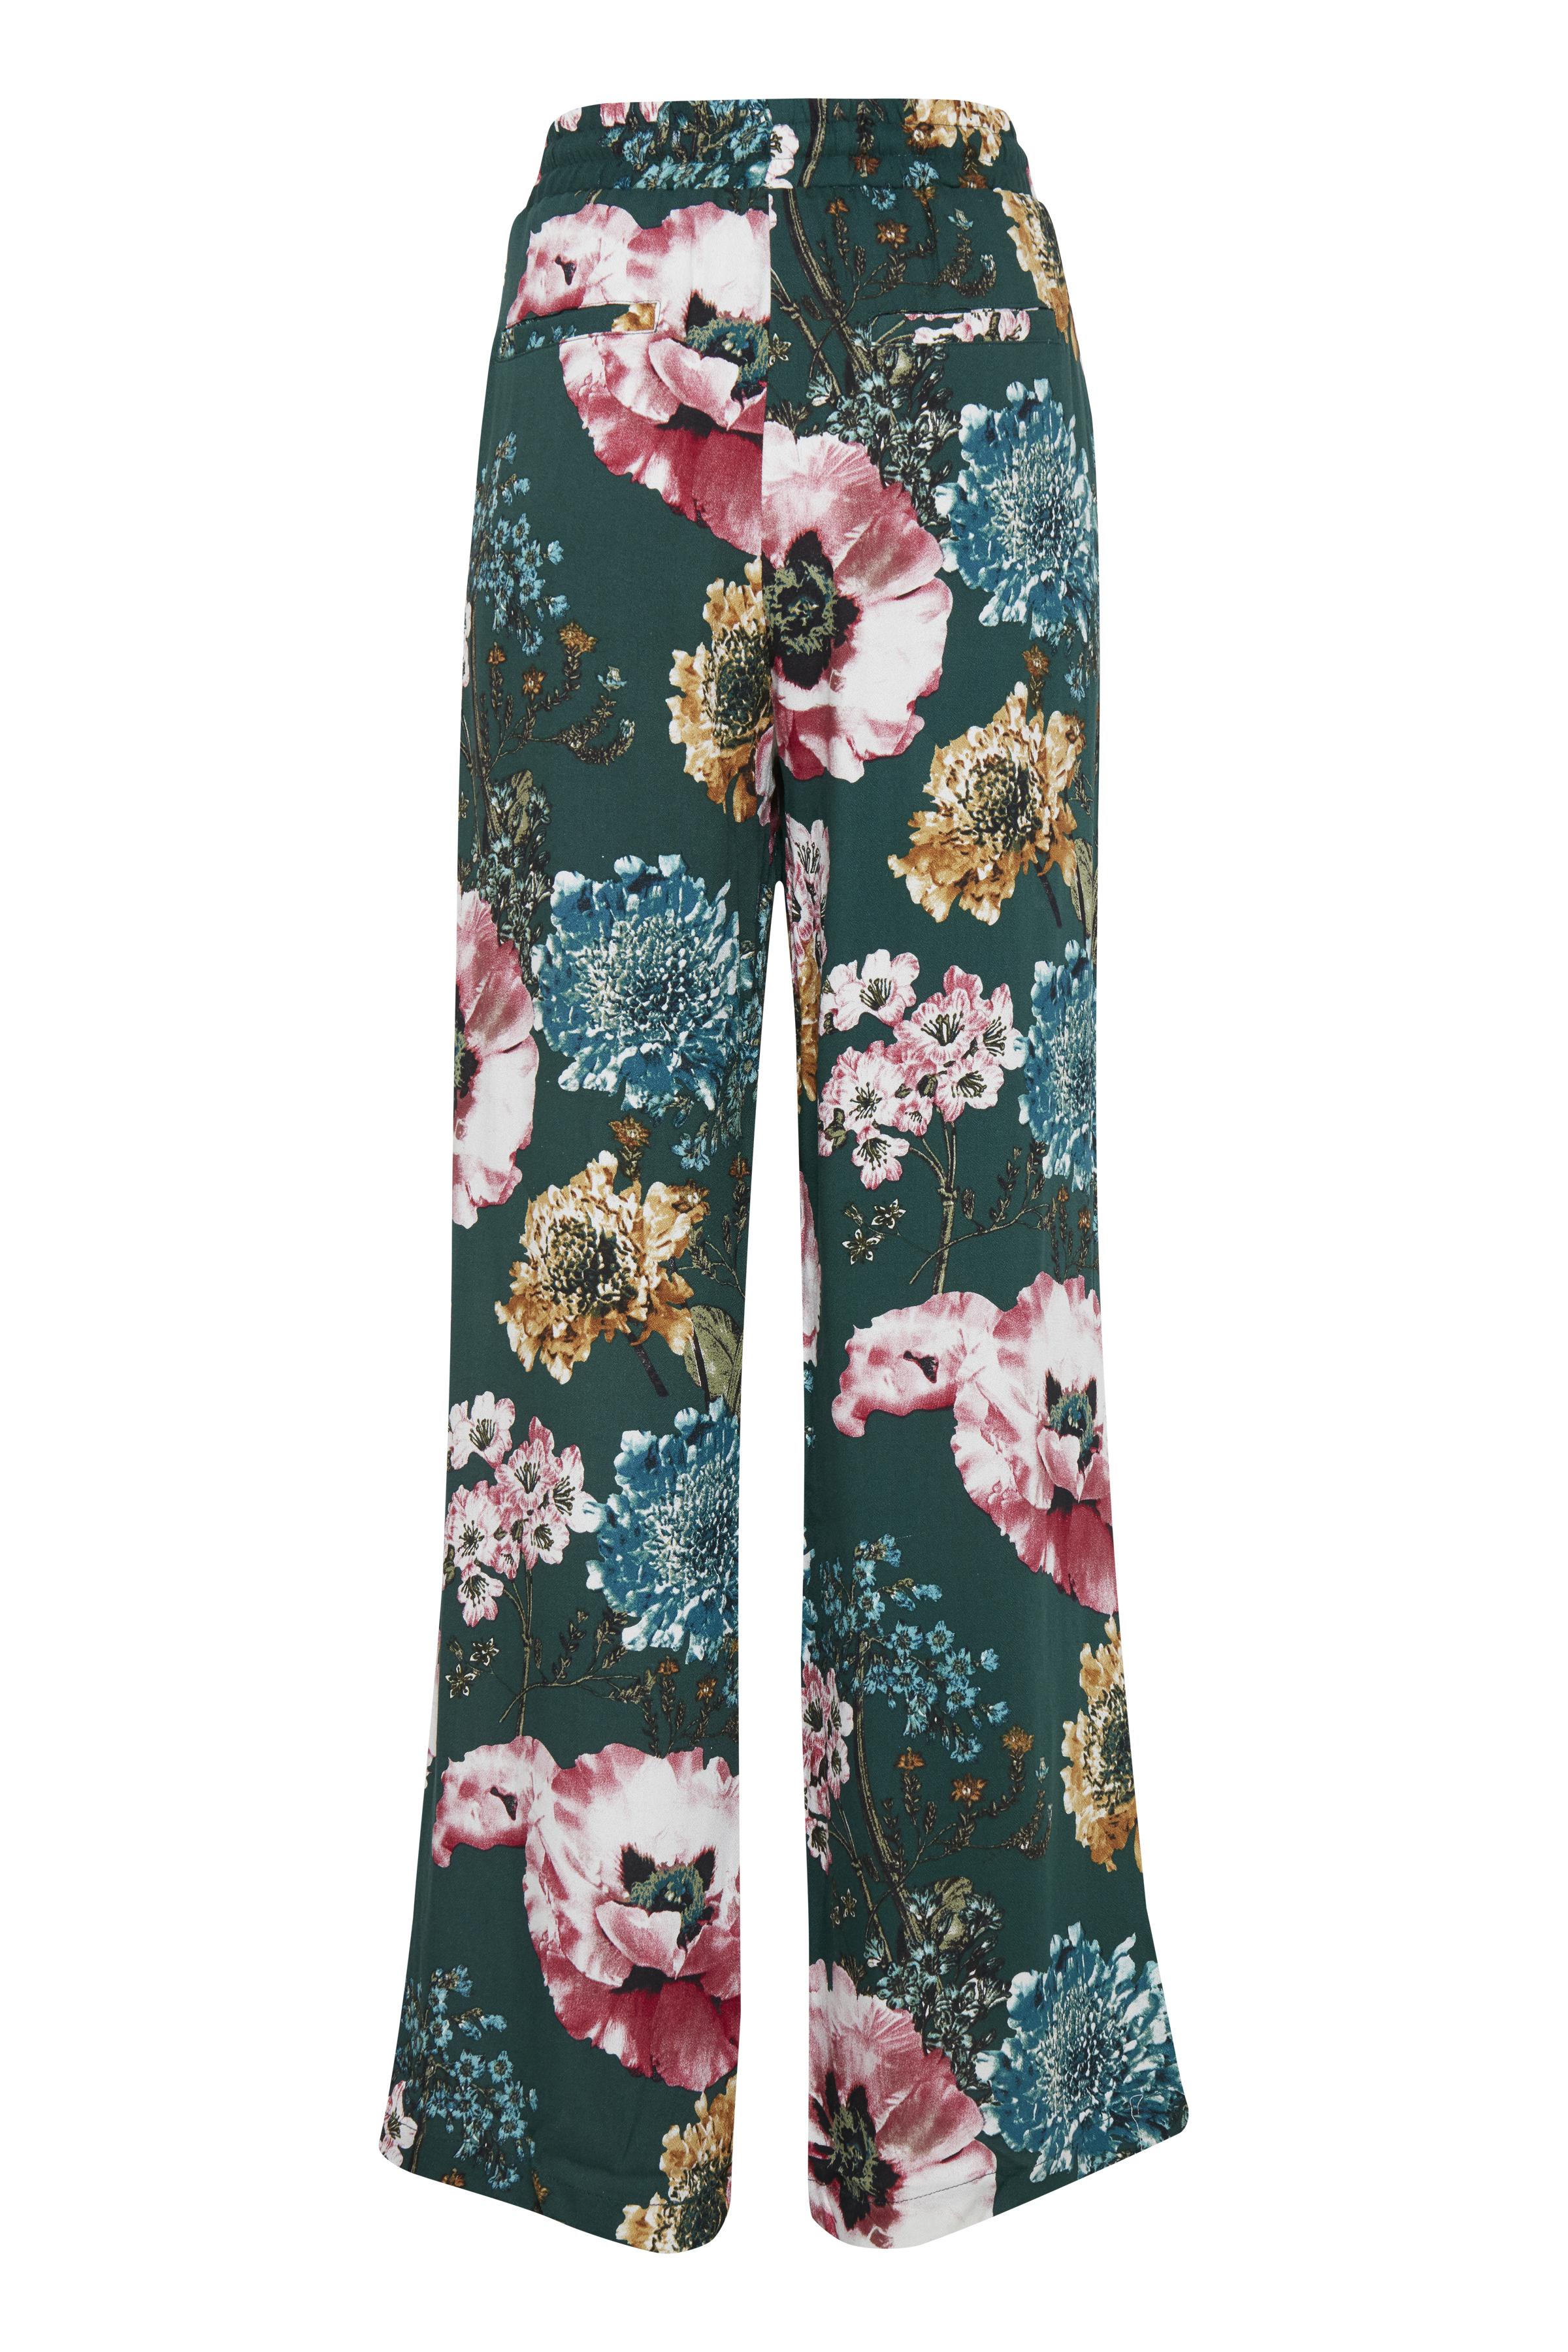 Buteljgrön/rosa Pants Casual från b.young – Köp Buteljgrön/rosa Pants Casual från storlek 36-44 här